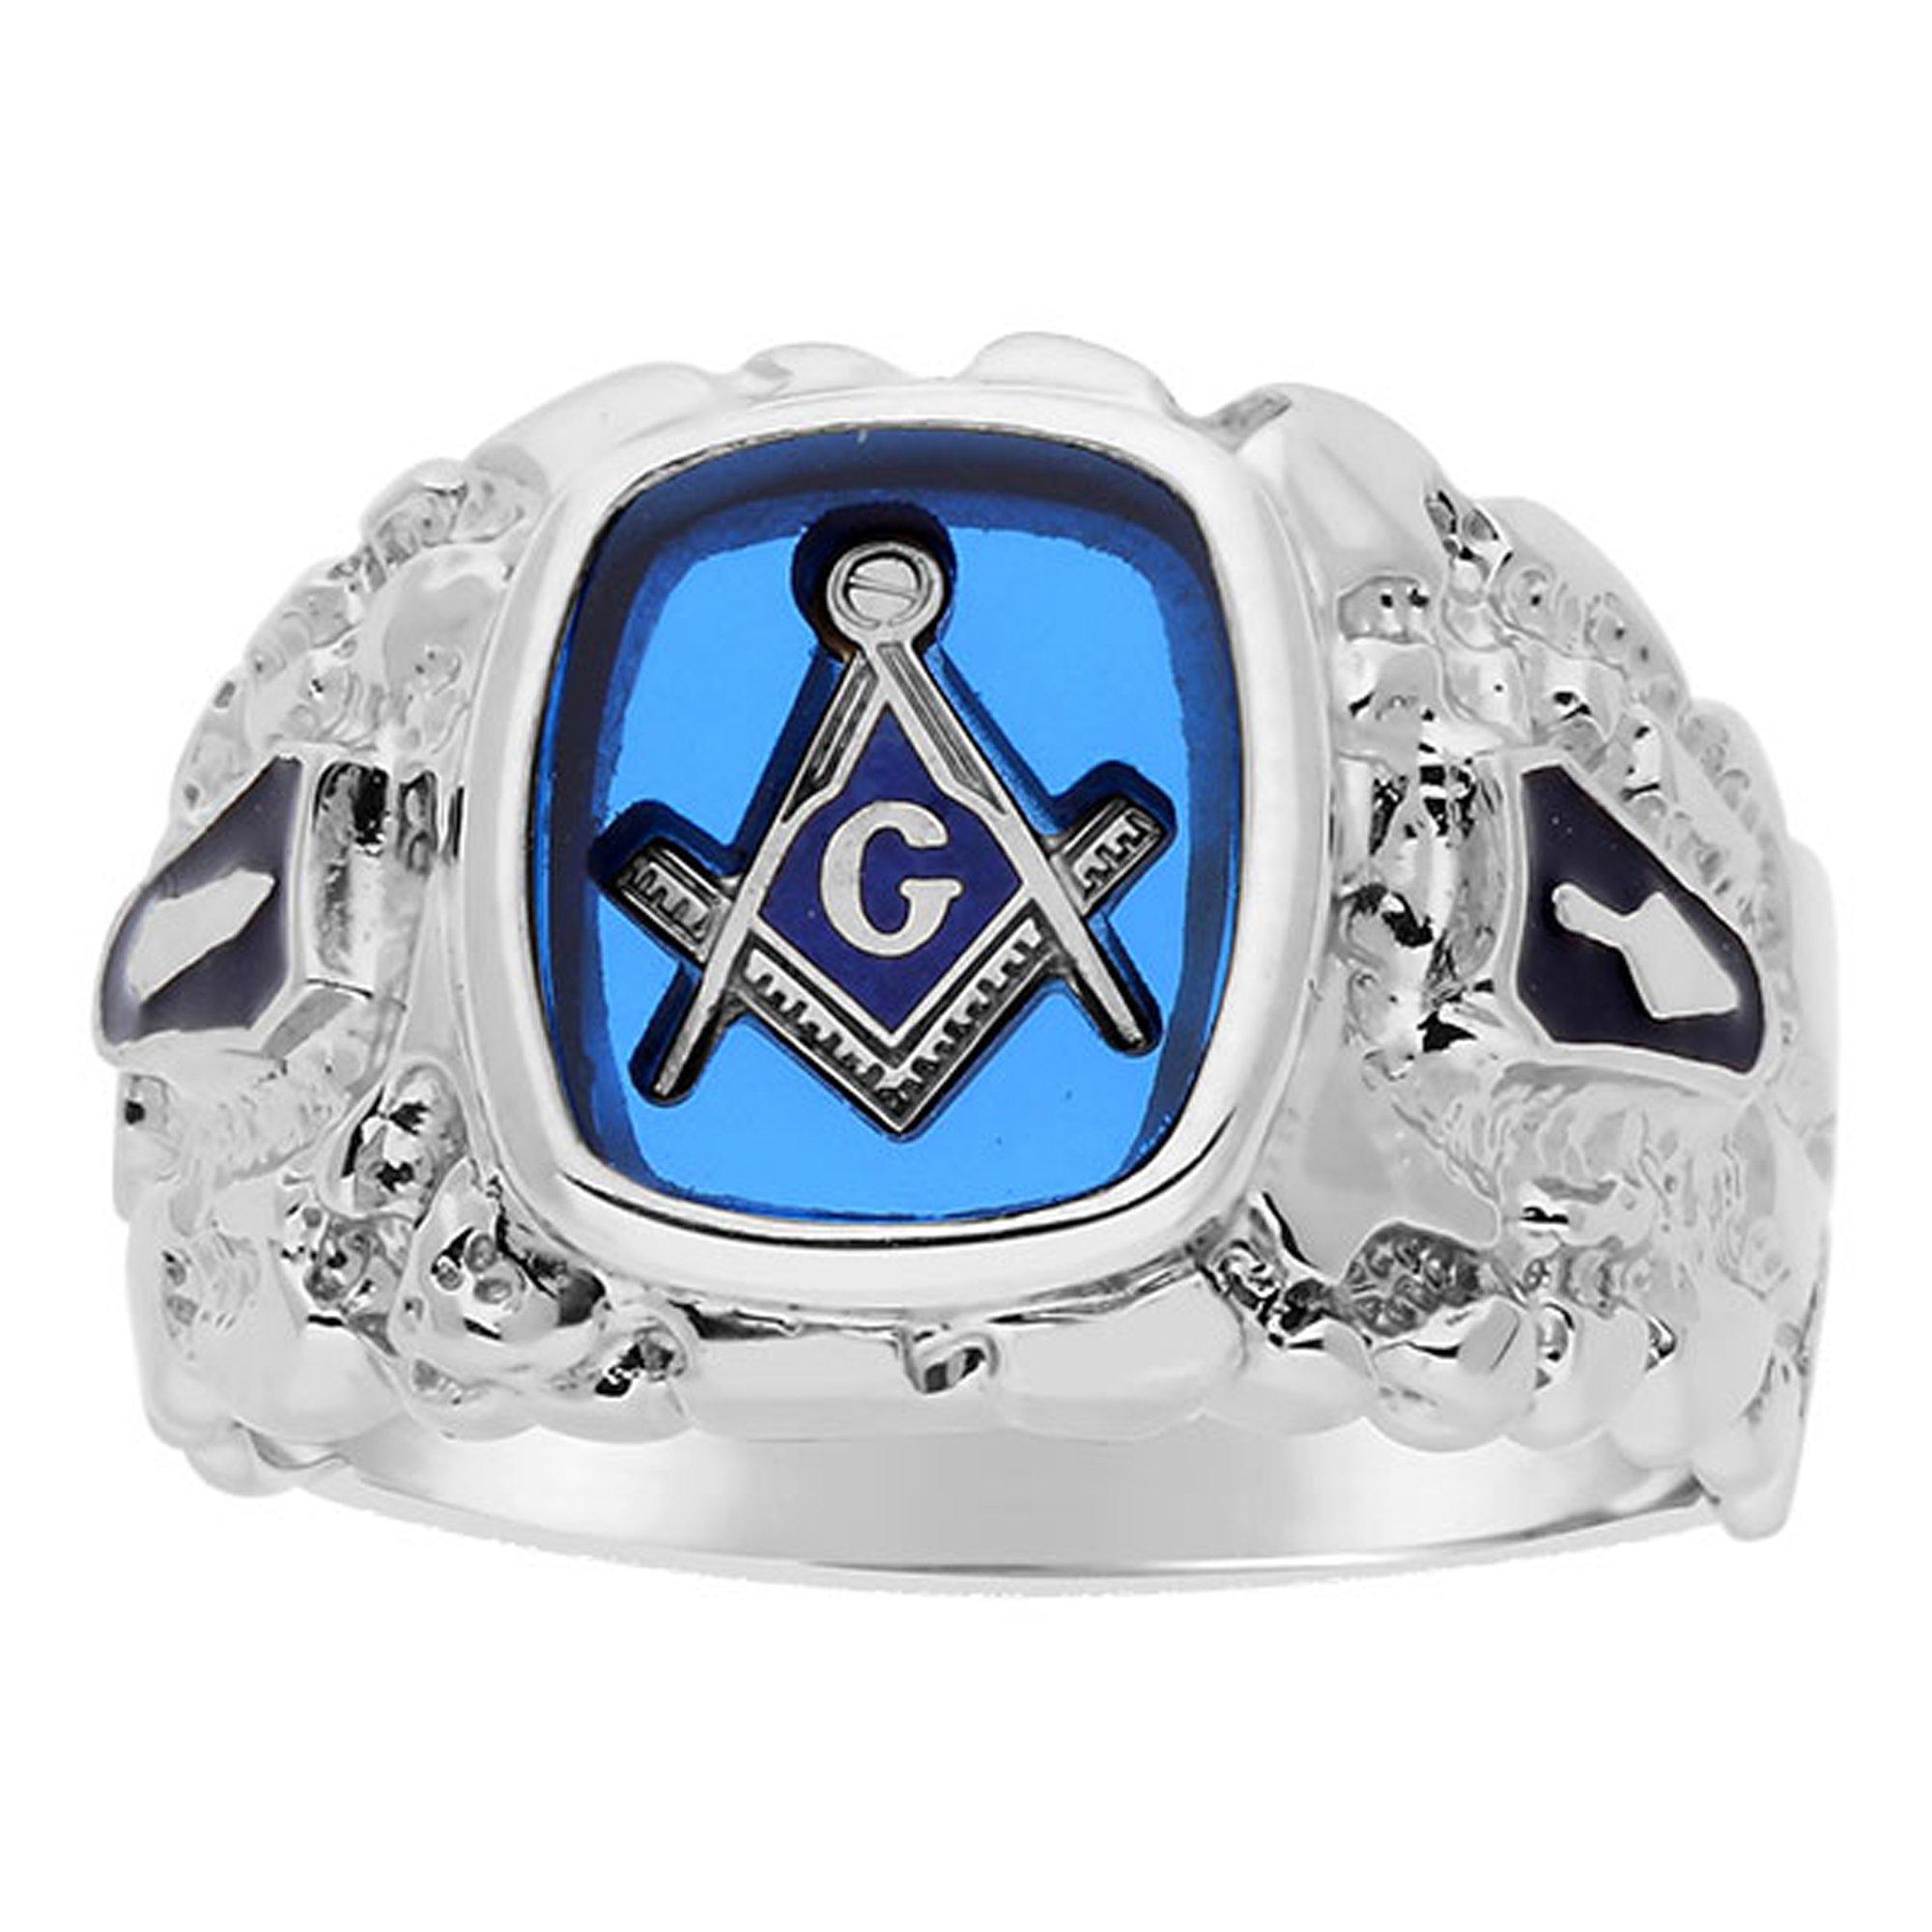 I.B.G. Sterling Silver Masonic Blue Lodge Ring (13) by I.B.G.